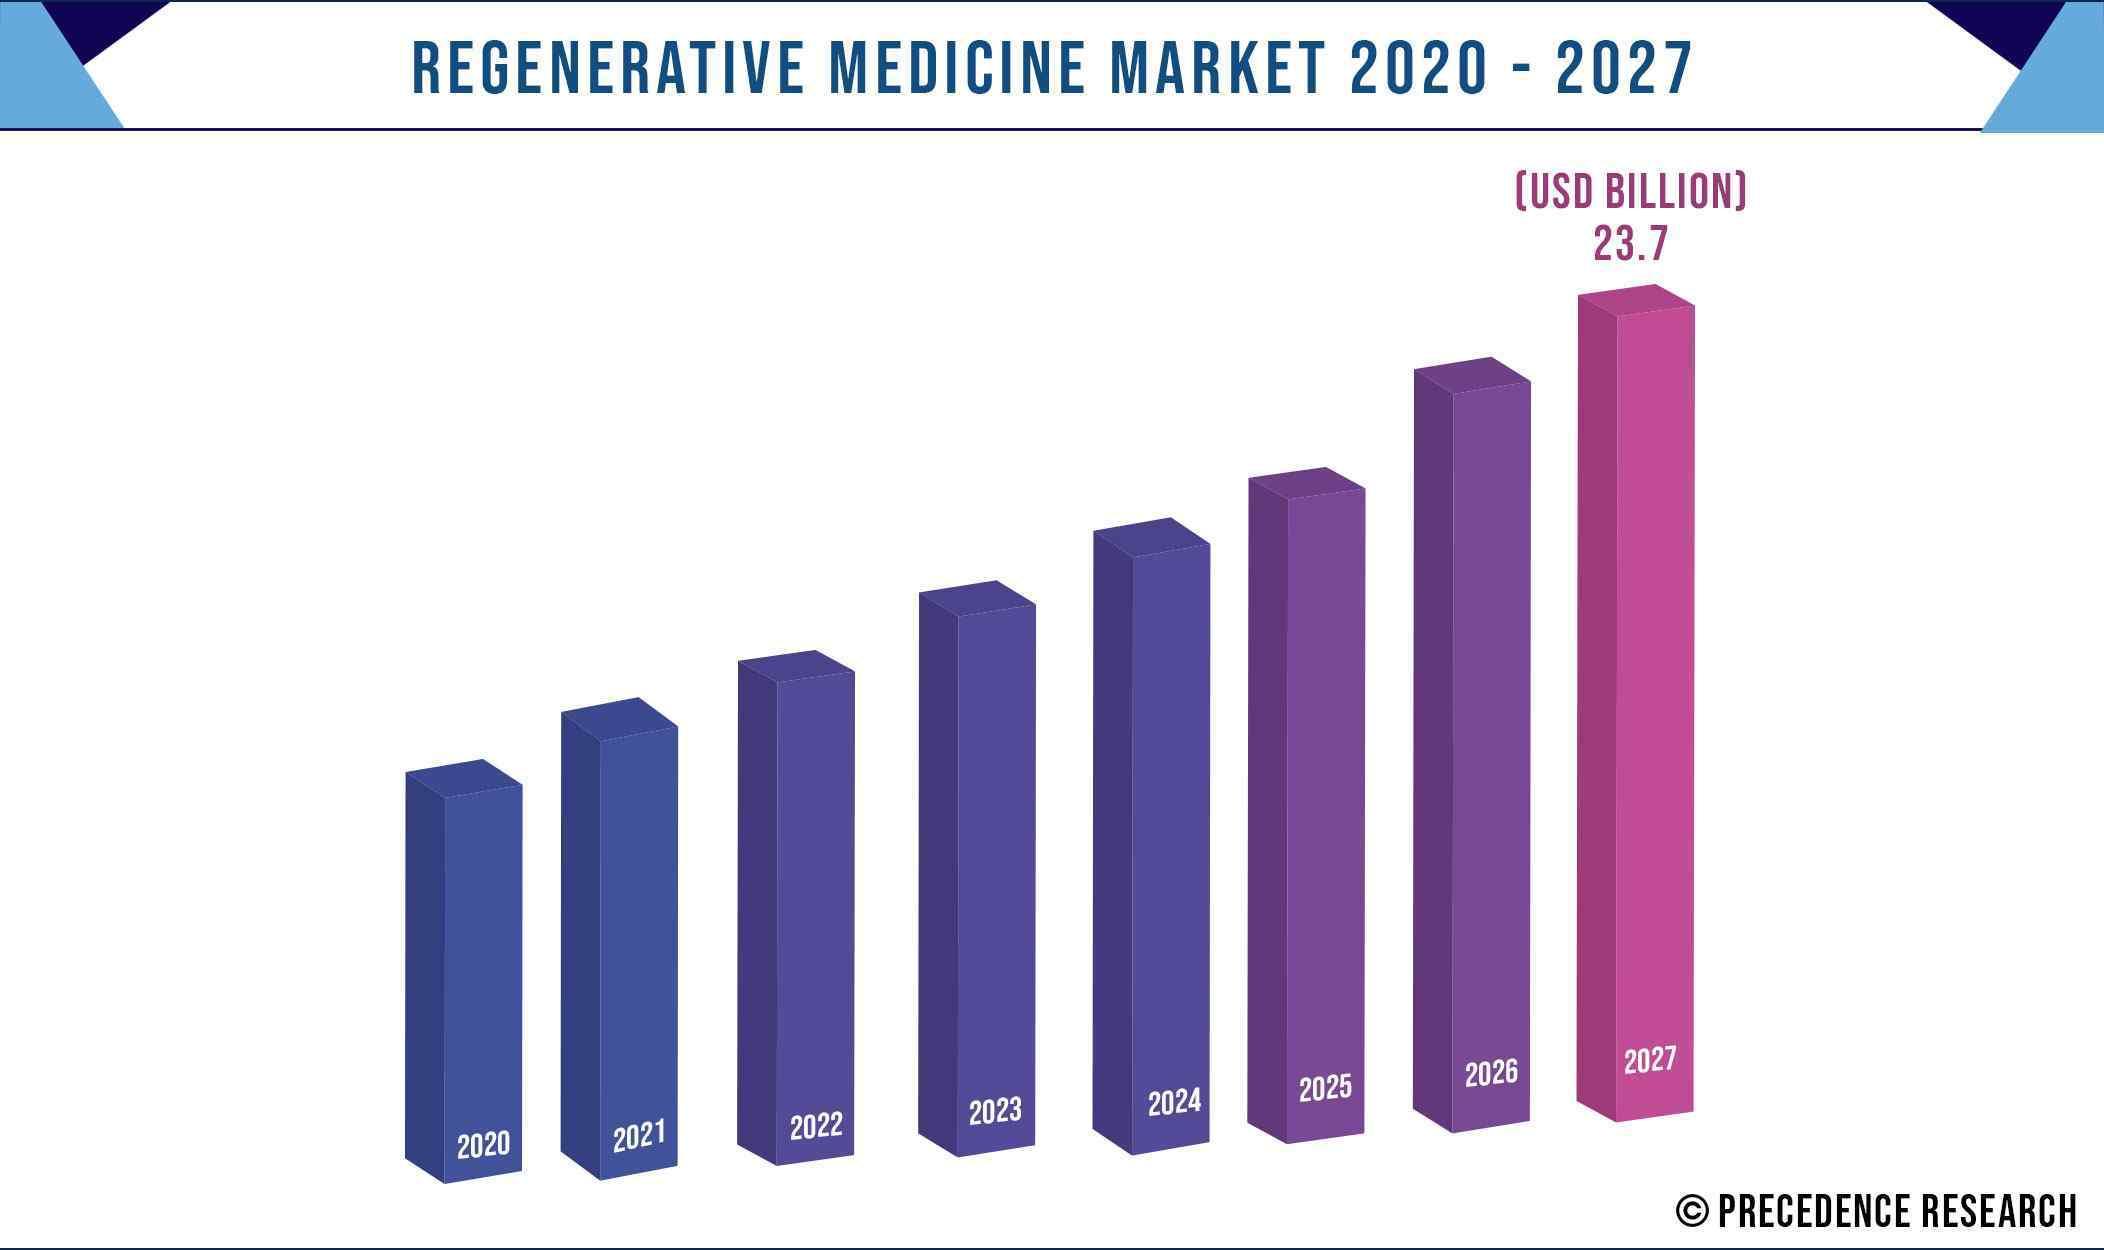 Regenerative Medicine Market Size 2020-2027